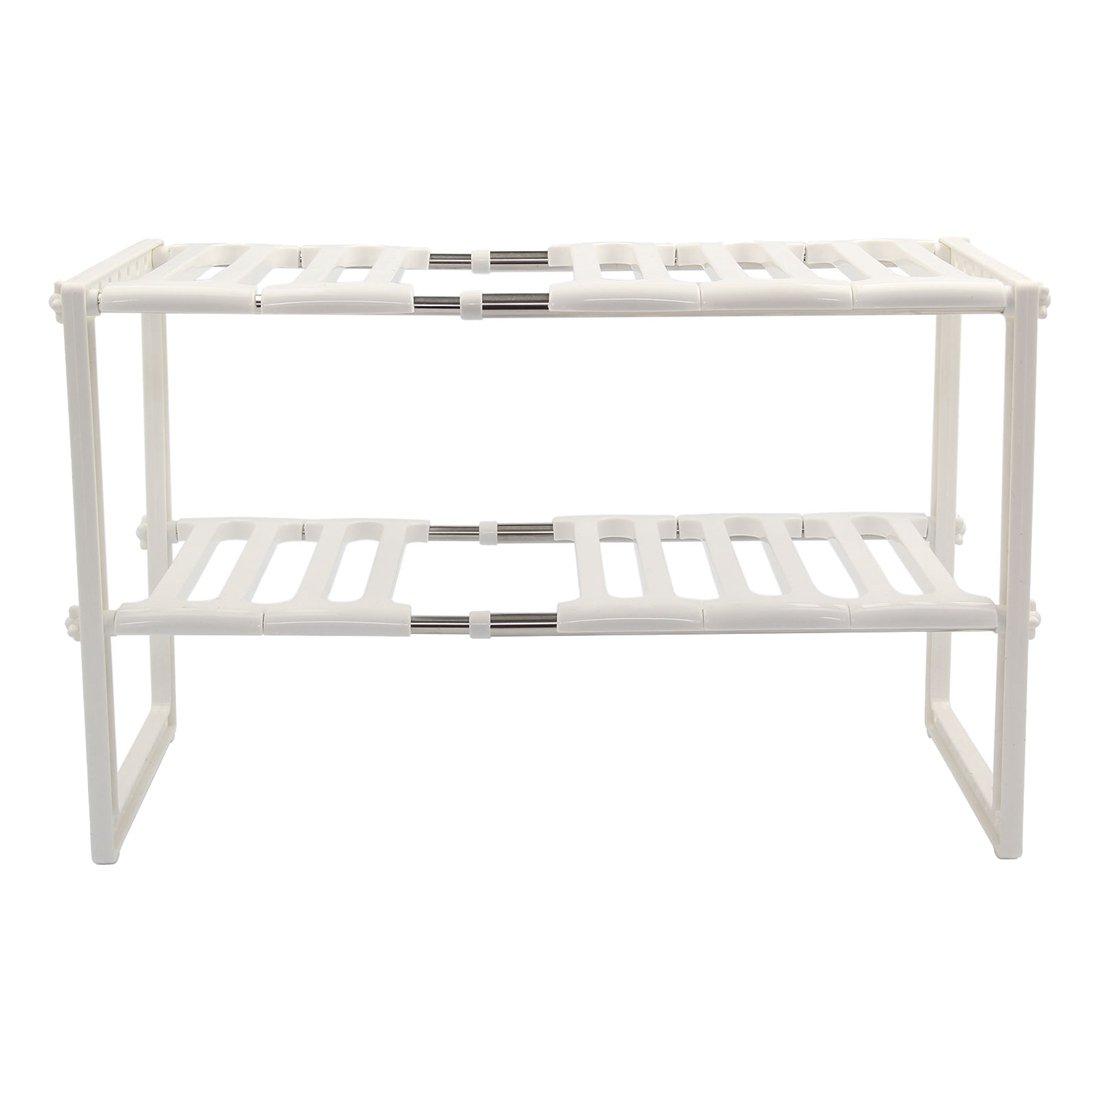 Storage Shelf - TOOGOO(R)Kitchen Rack Organiser Adjustable Removeable Under Sink Storage Tidy Shelf Unit by TOOGOO(R)